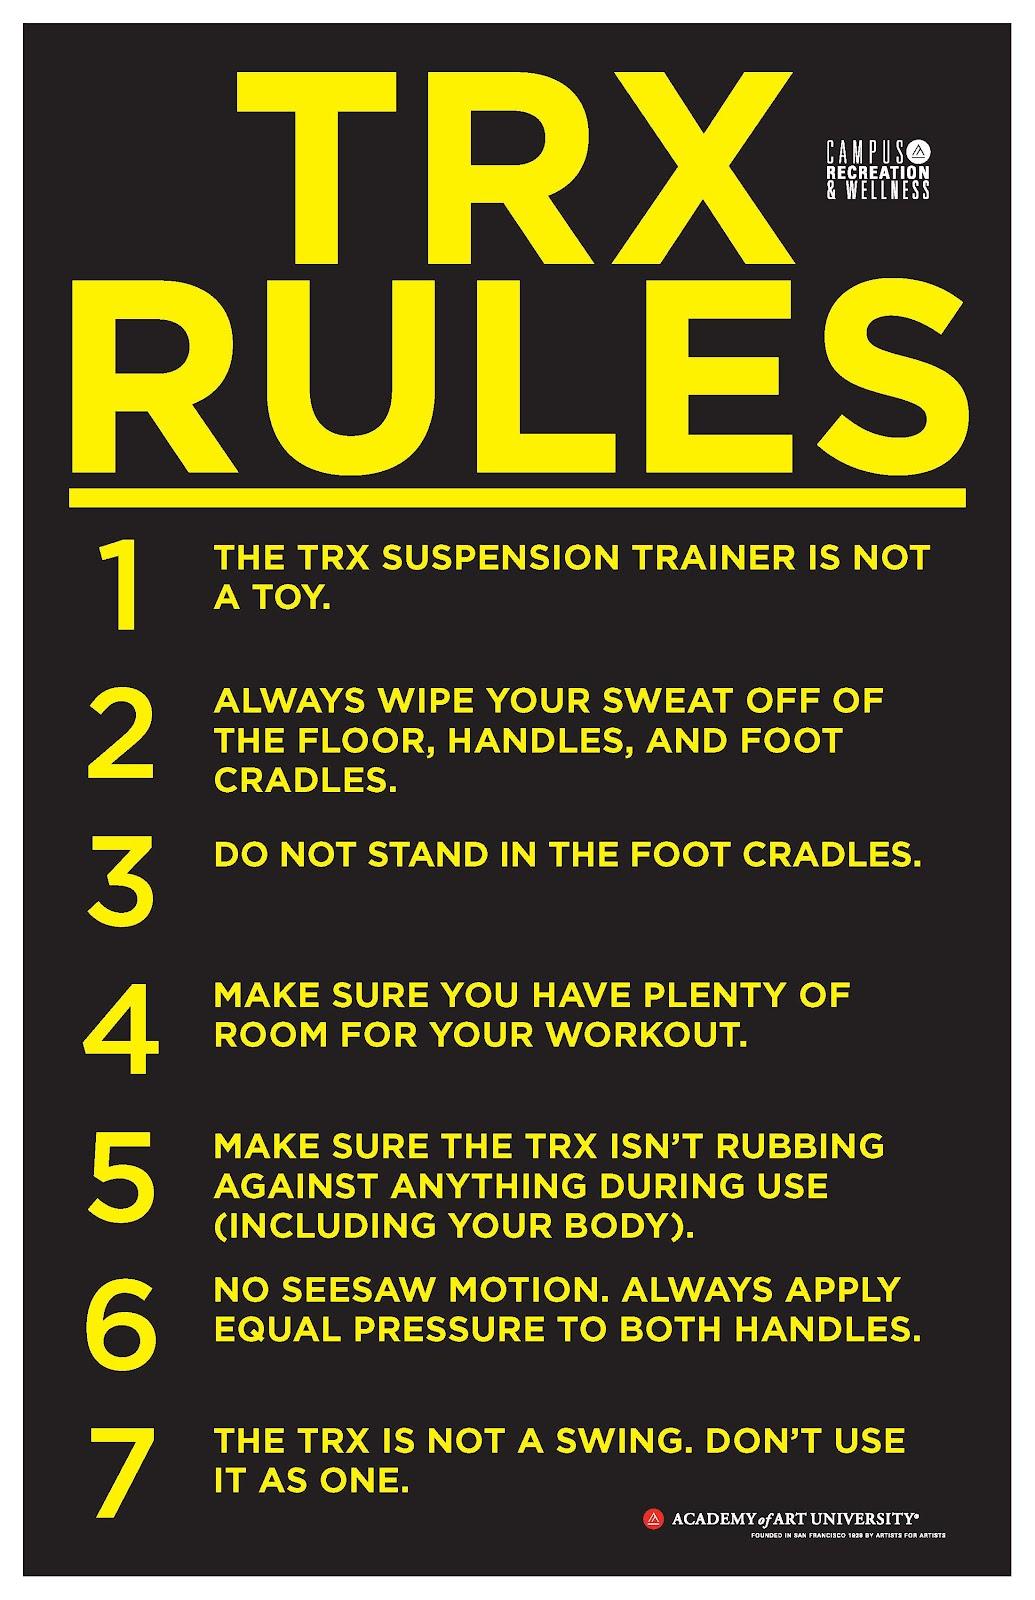 TRX Workout #2: 3 Leg Exercises | Campus Recreation & Wellness (CReW)